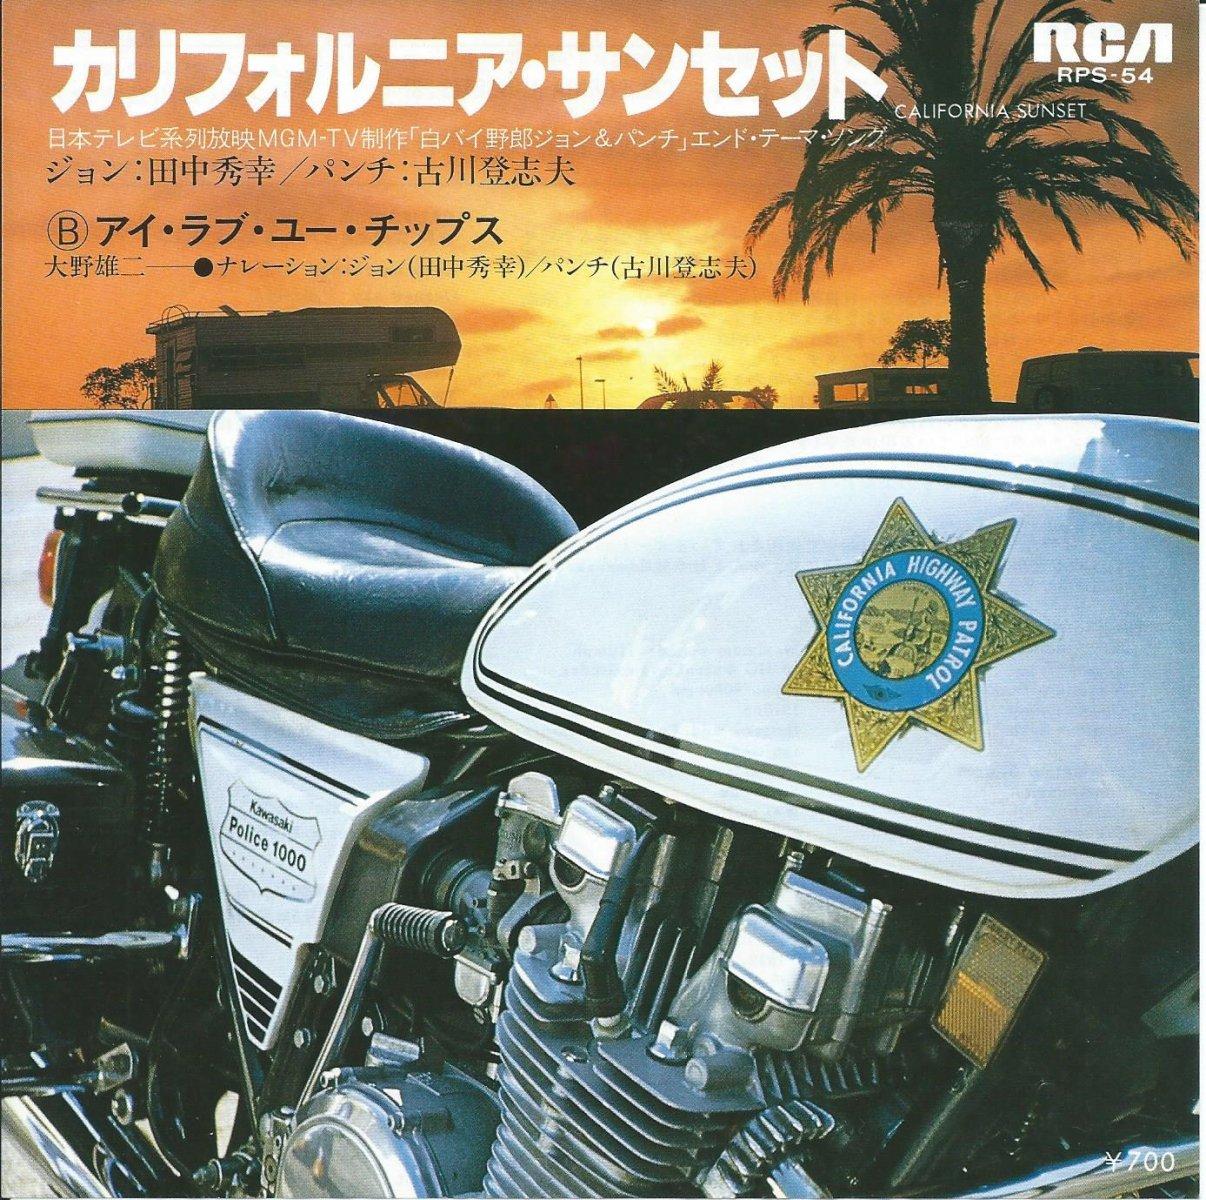 O.S.T.(YUJI OHNO 大野雄二) / カリフォルニア・サンセット (白バイ野郎ジョン&パンチ ) (7